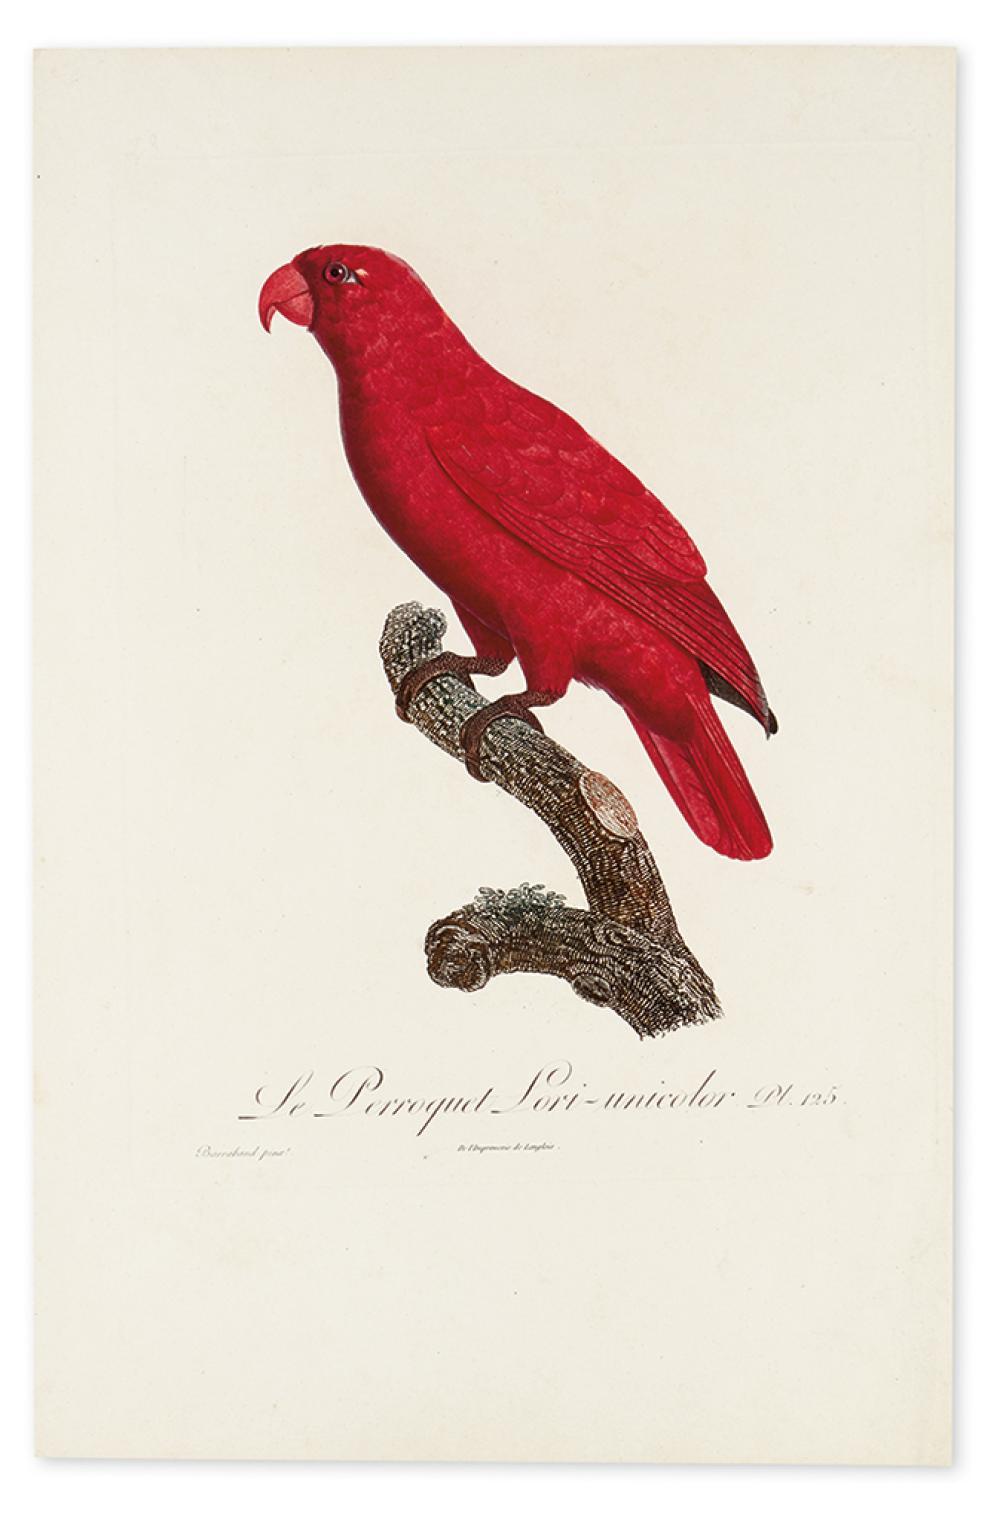 BARRABAND, JACQUES. Le Perroquet Lori-unicolor. Pl. 125.